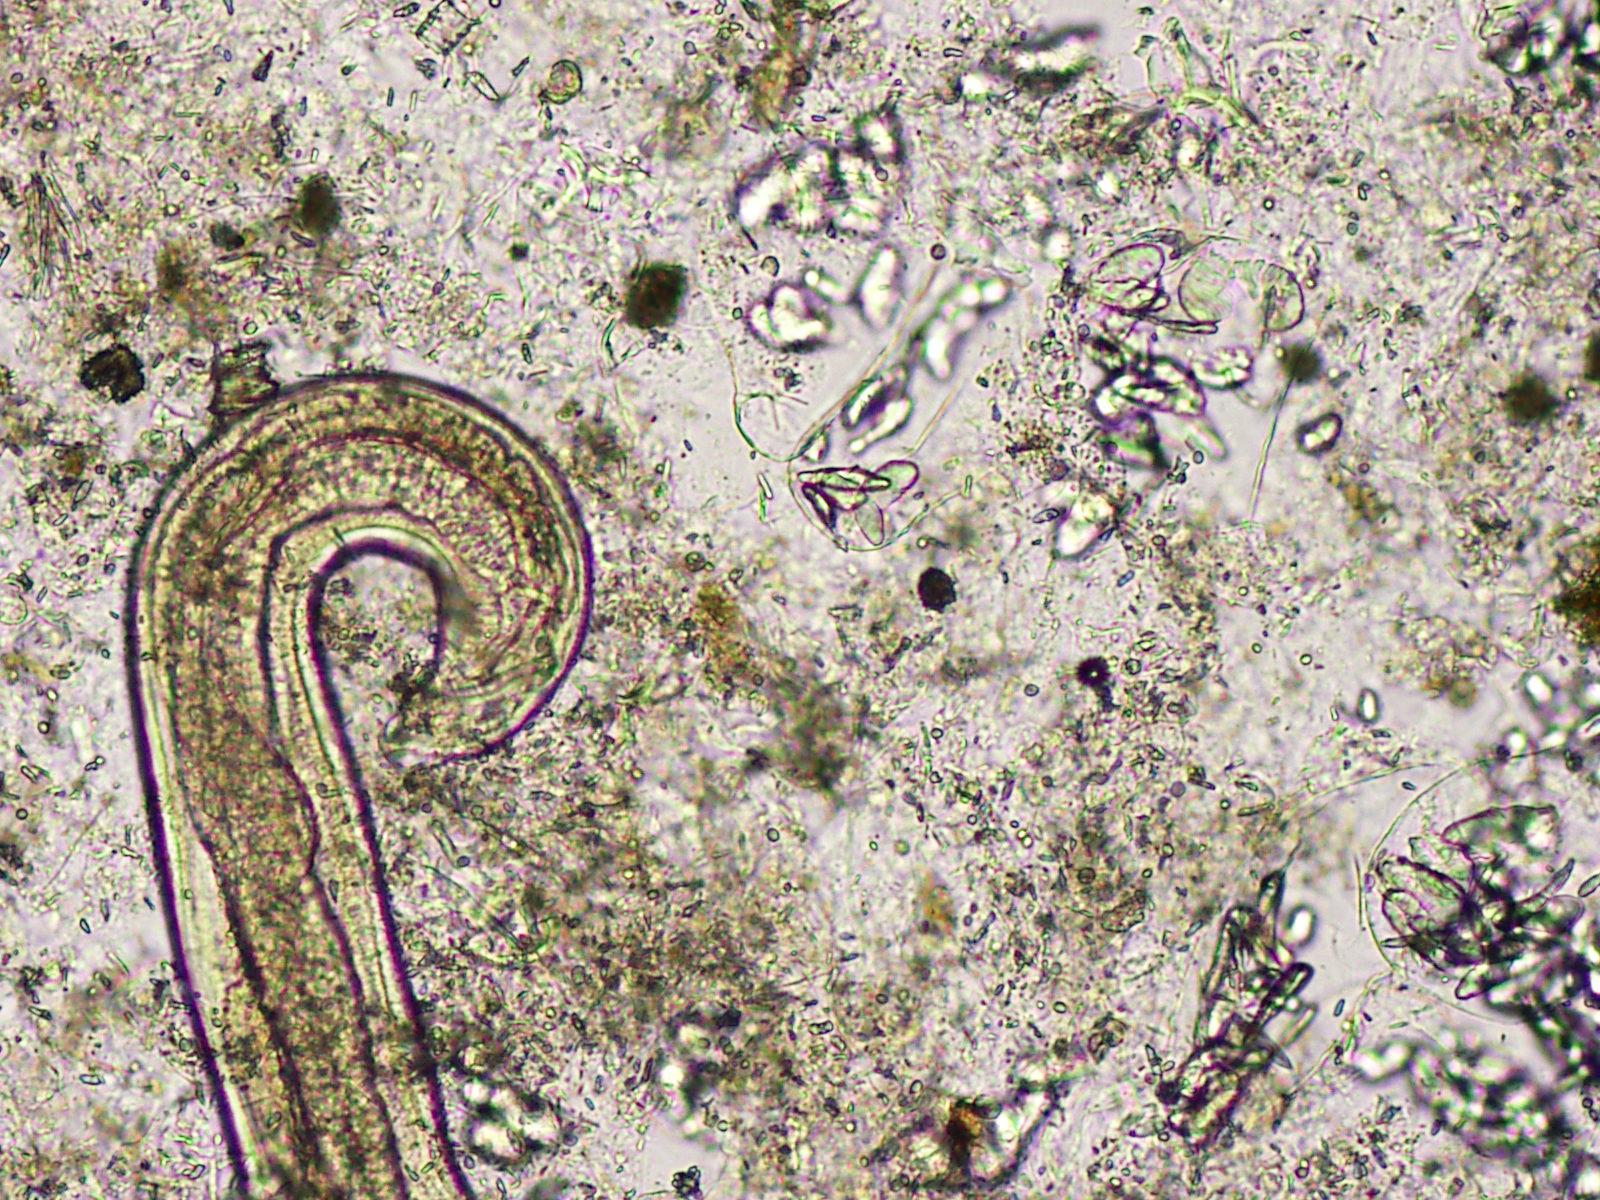 Creepy Dreadful Wonderful Parasites: Case of the Week 430  |Beautiful Parasites